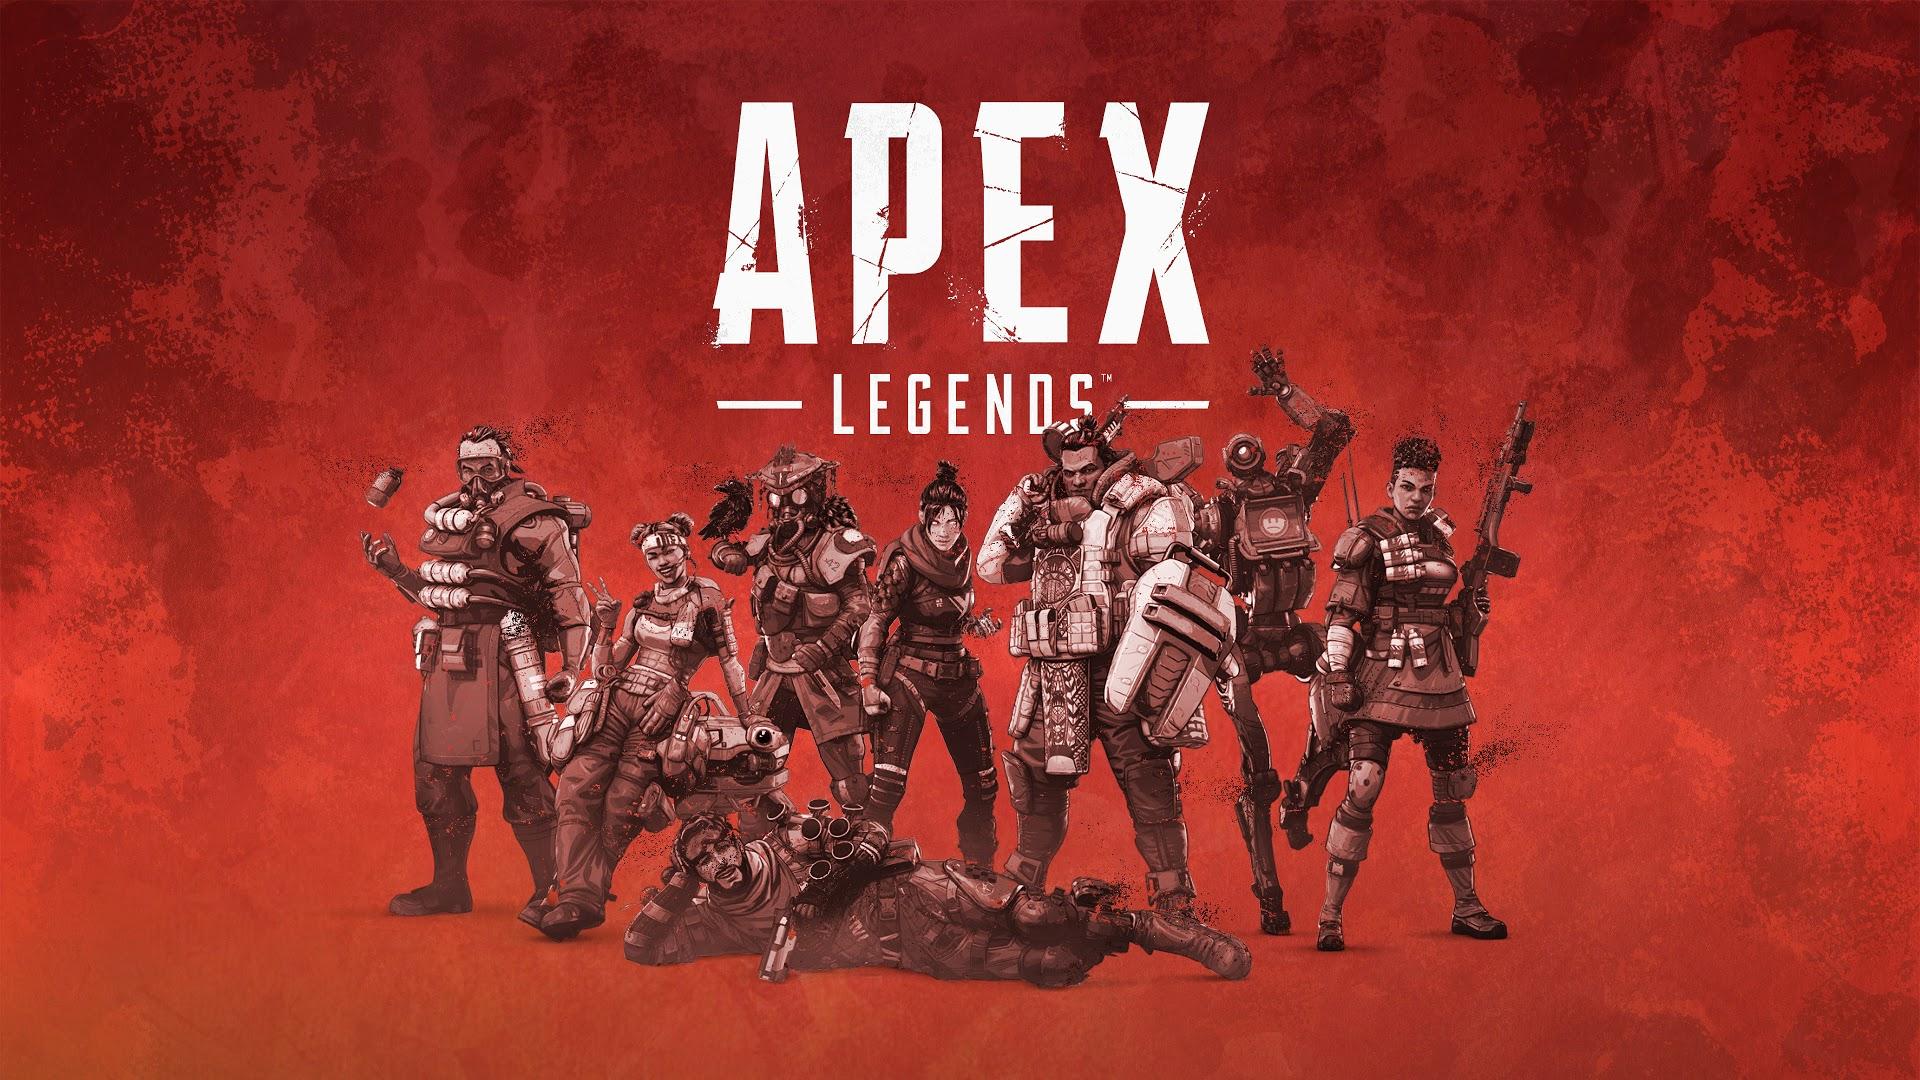 Apex Legends壁紙 Apex エーペックス の画像 壁紙まとめ Magnet